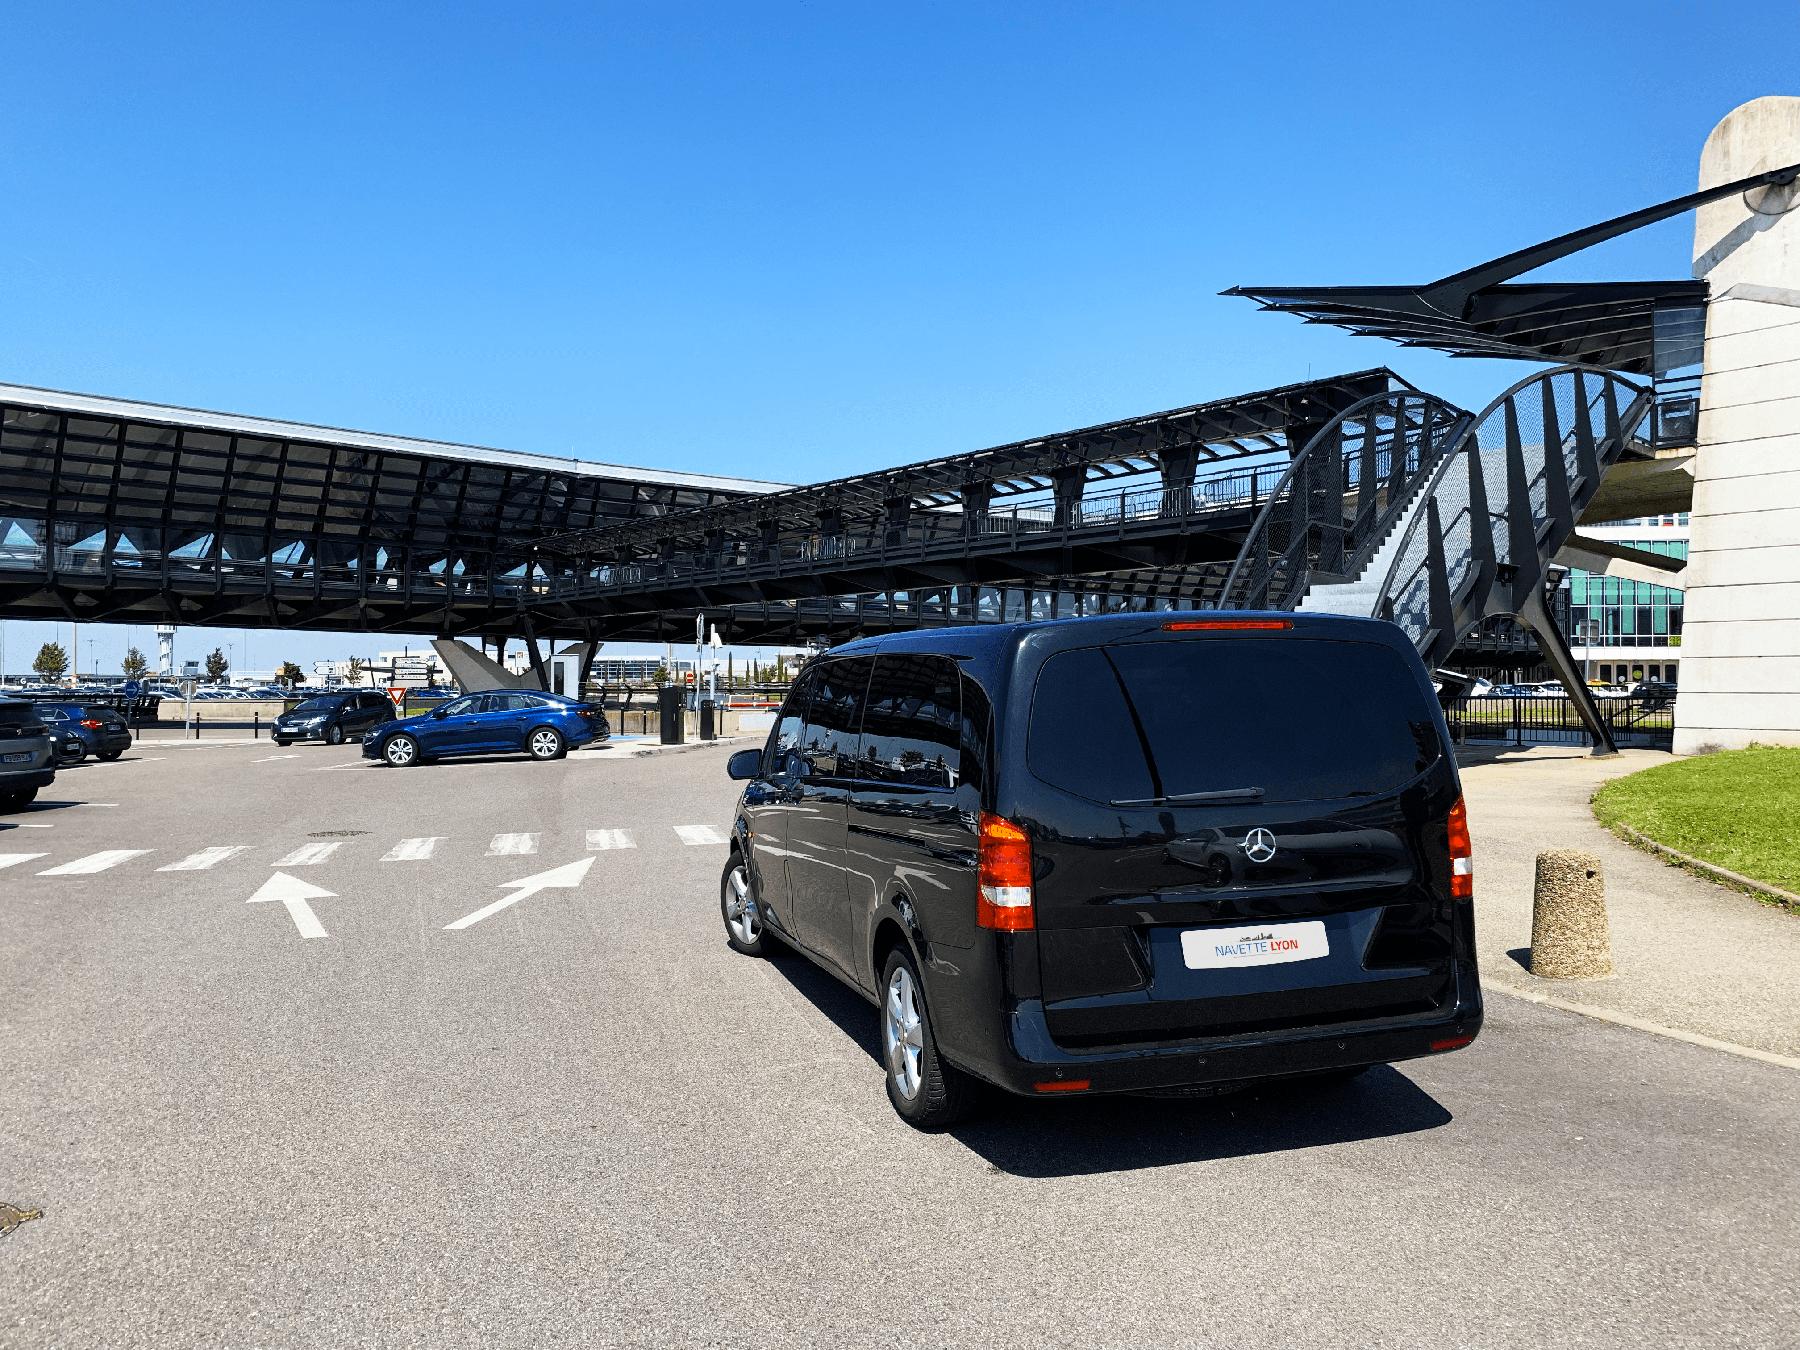 Minivan Navette Lyon Aéroport